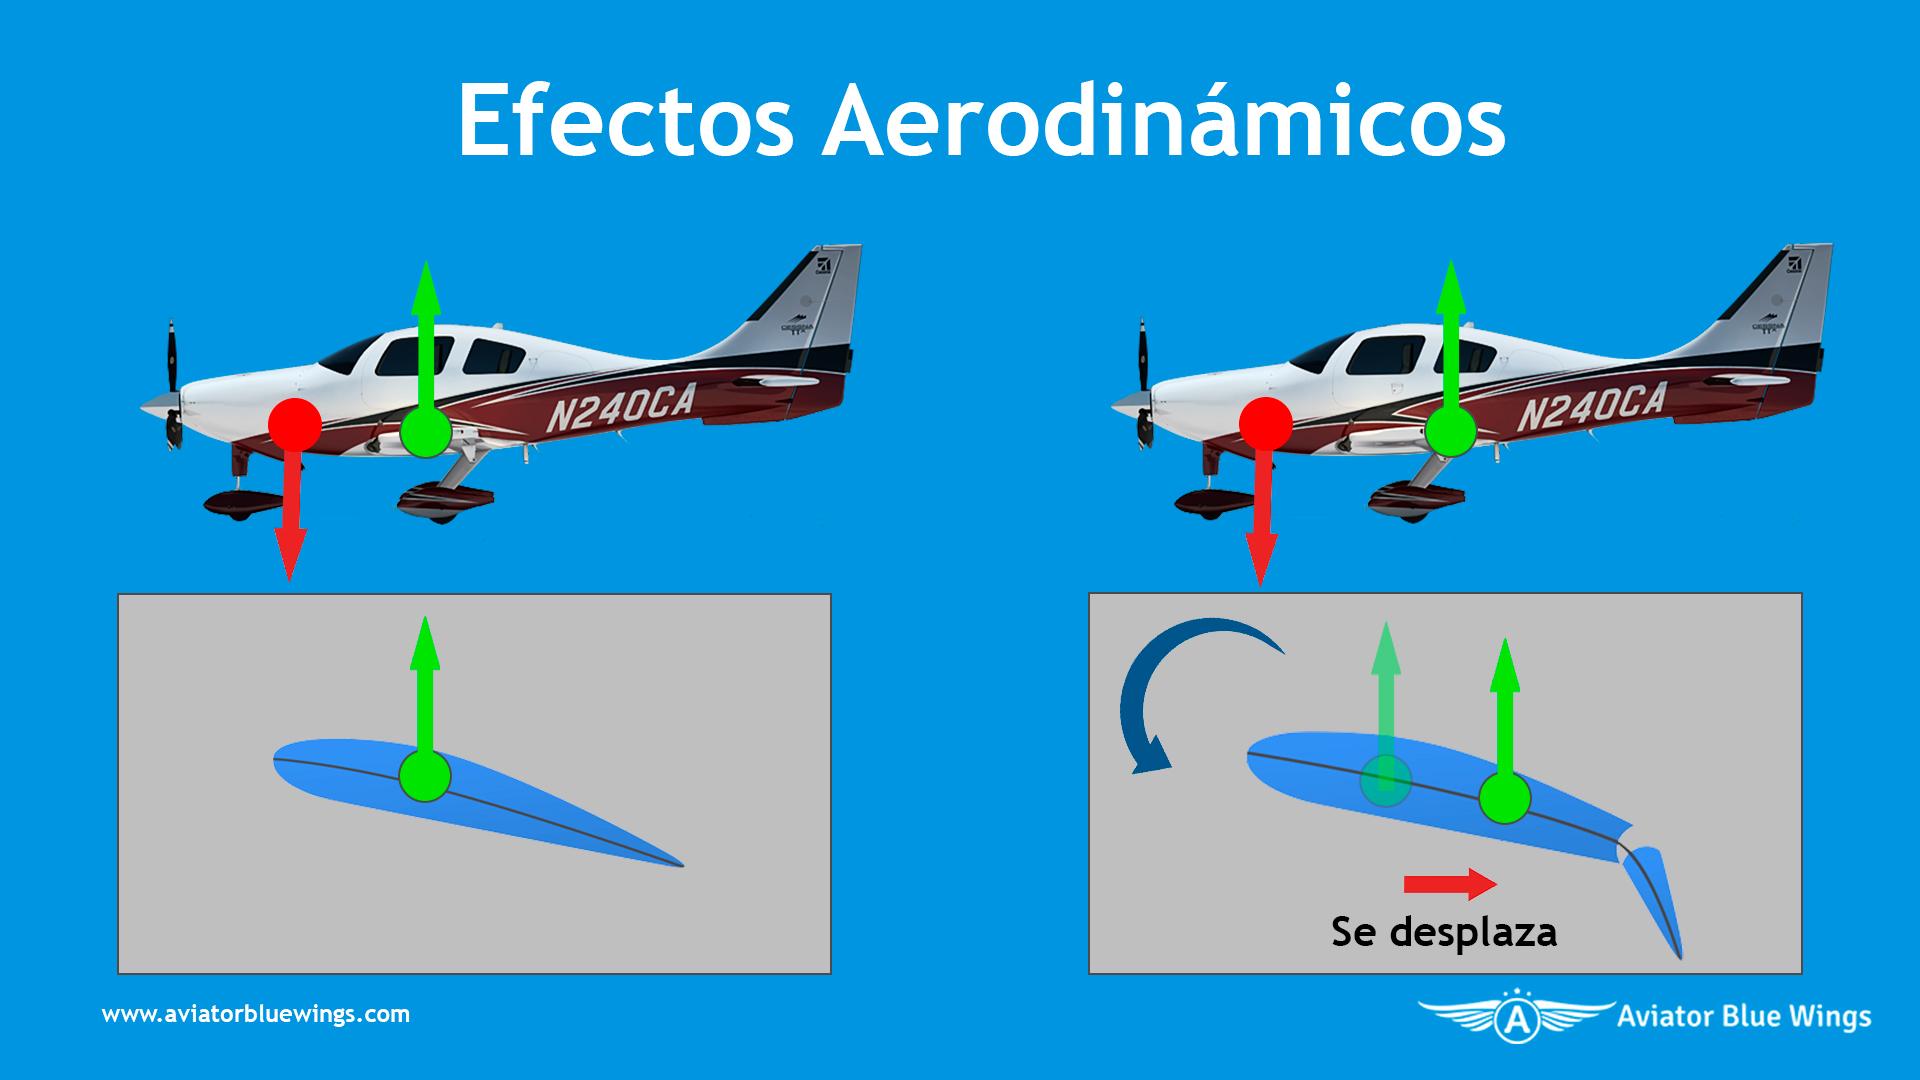 Efectos Aerodinámicos